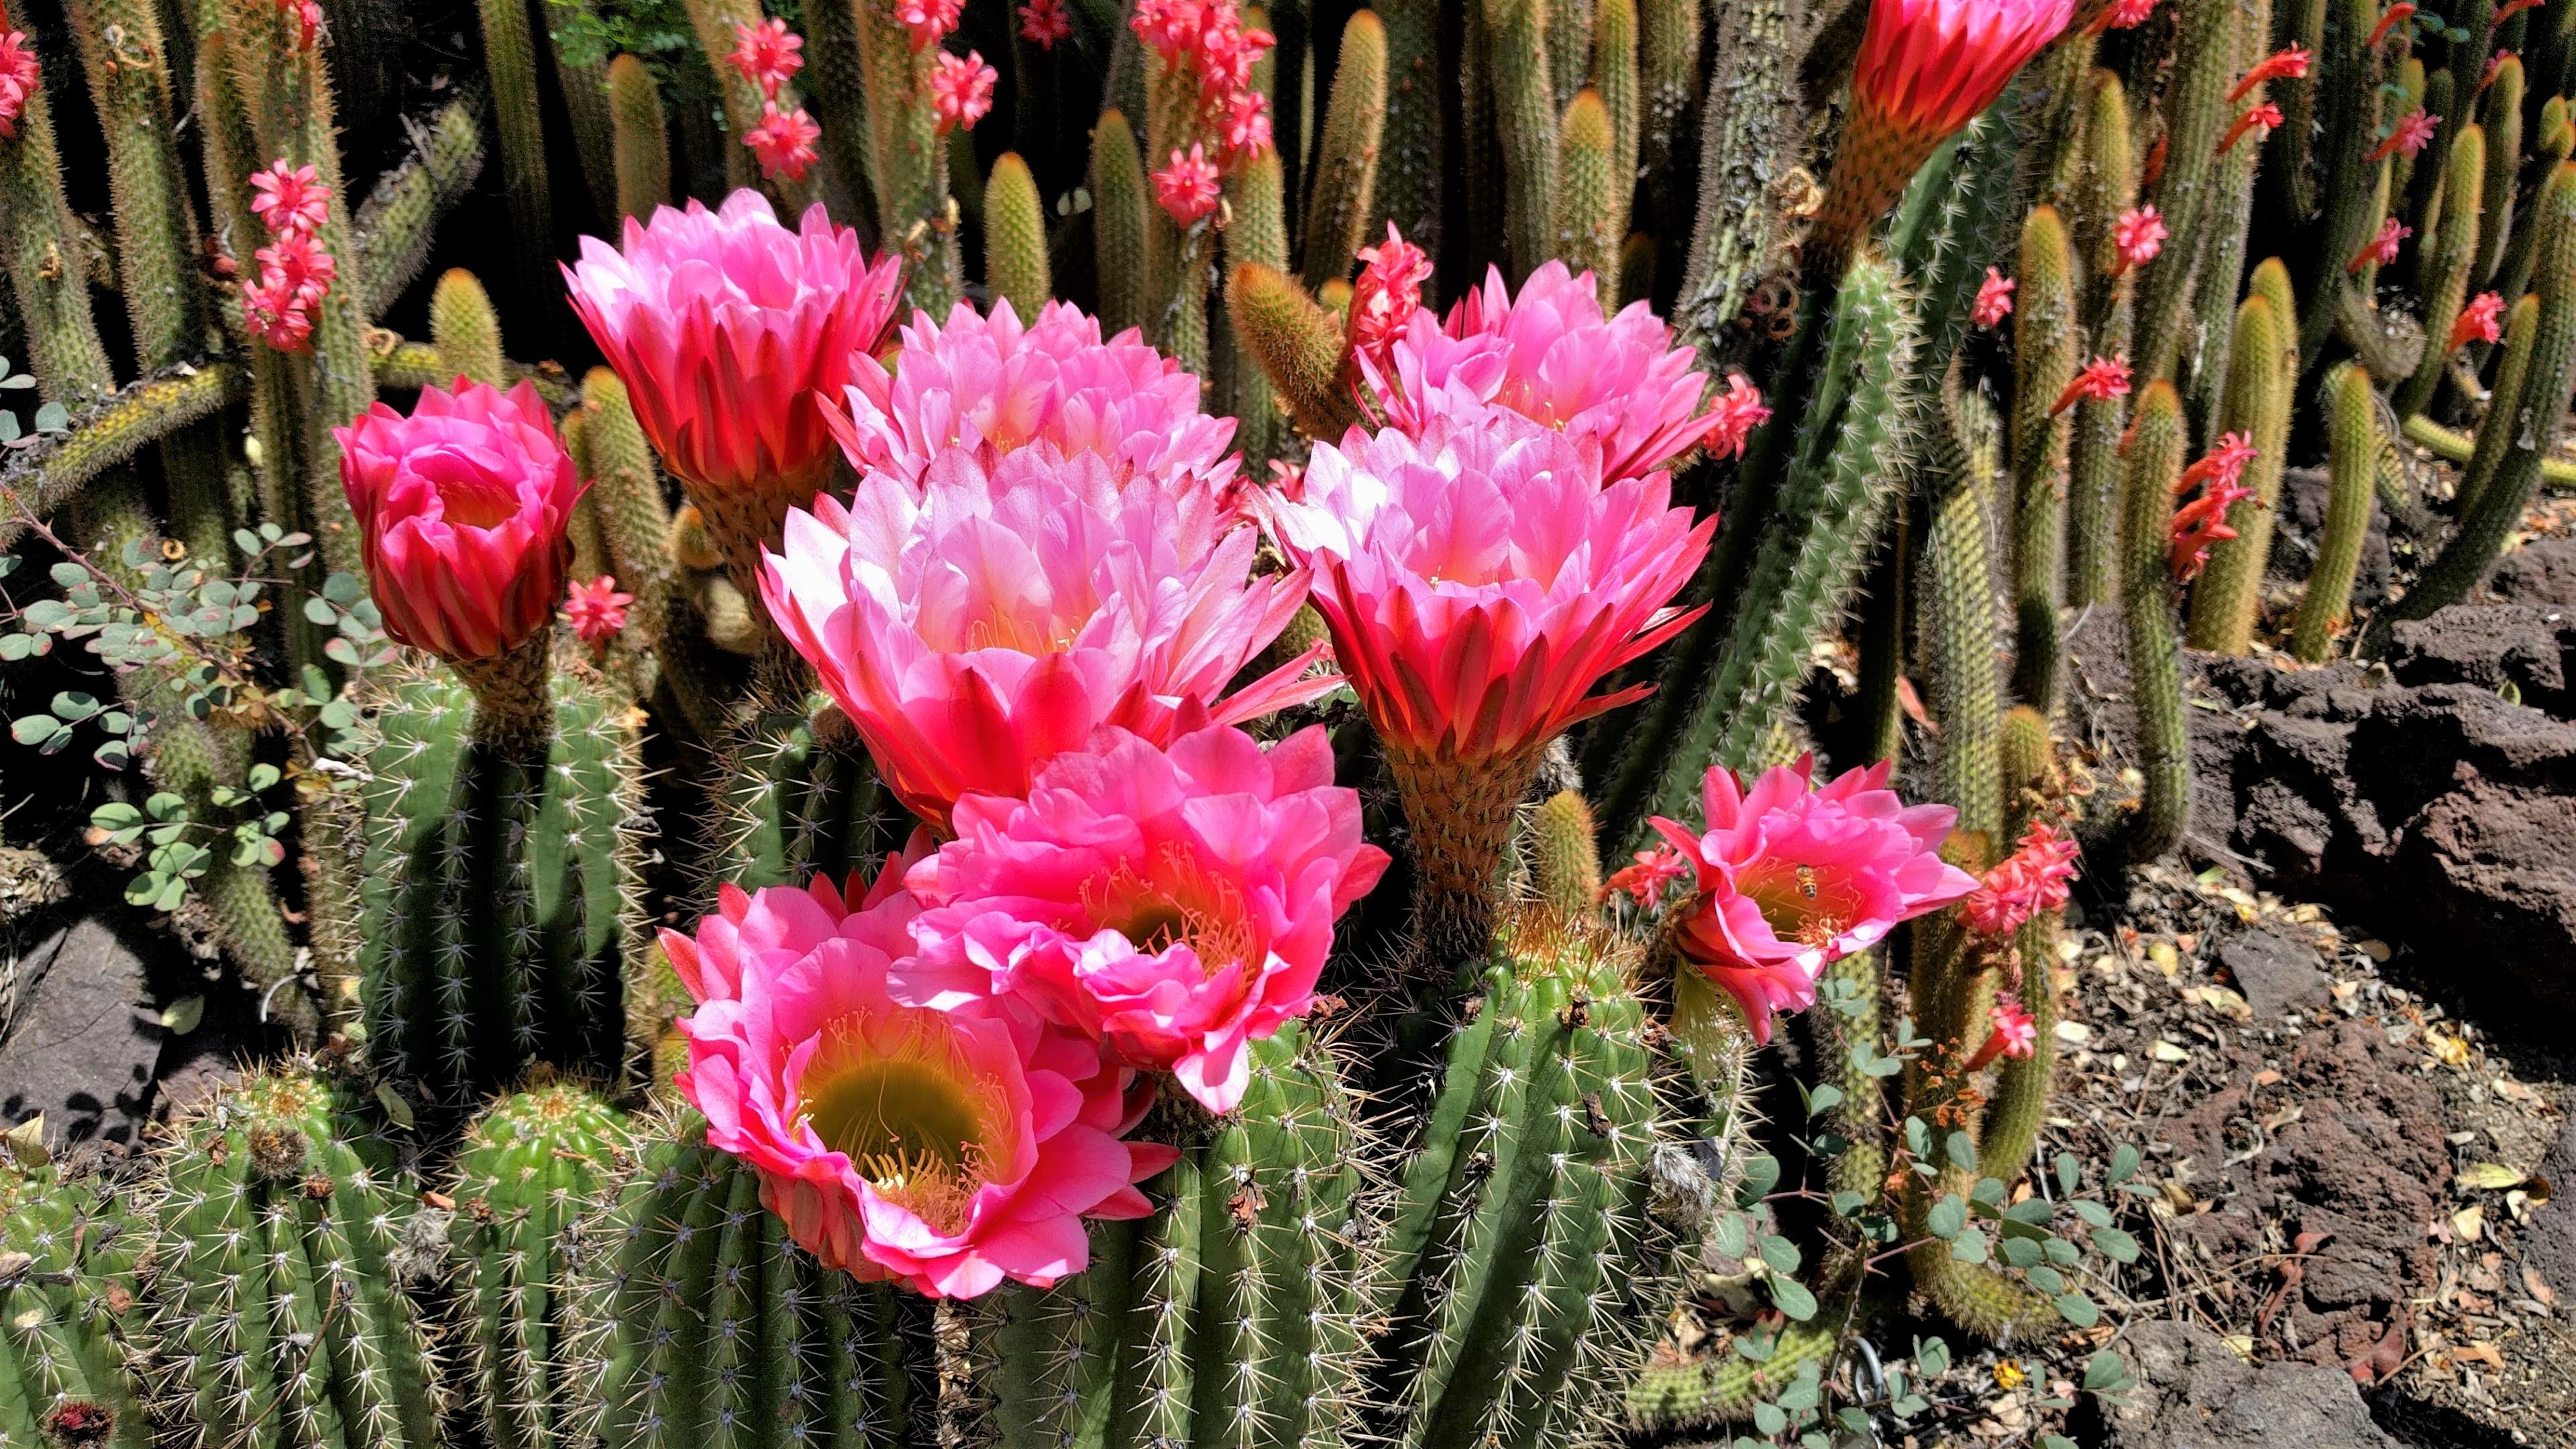 180516 140935 Huntington Botanical Gdn - Desert Gdn, Echinopsis mamillosa var kermesina, Cleistocactus icosagonus syn Borzicactus icosagonus